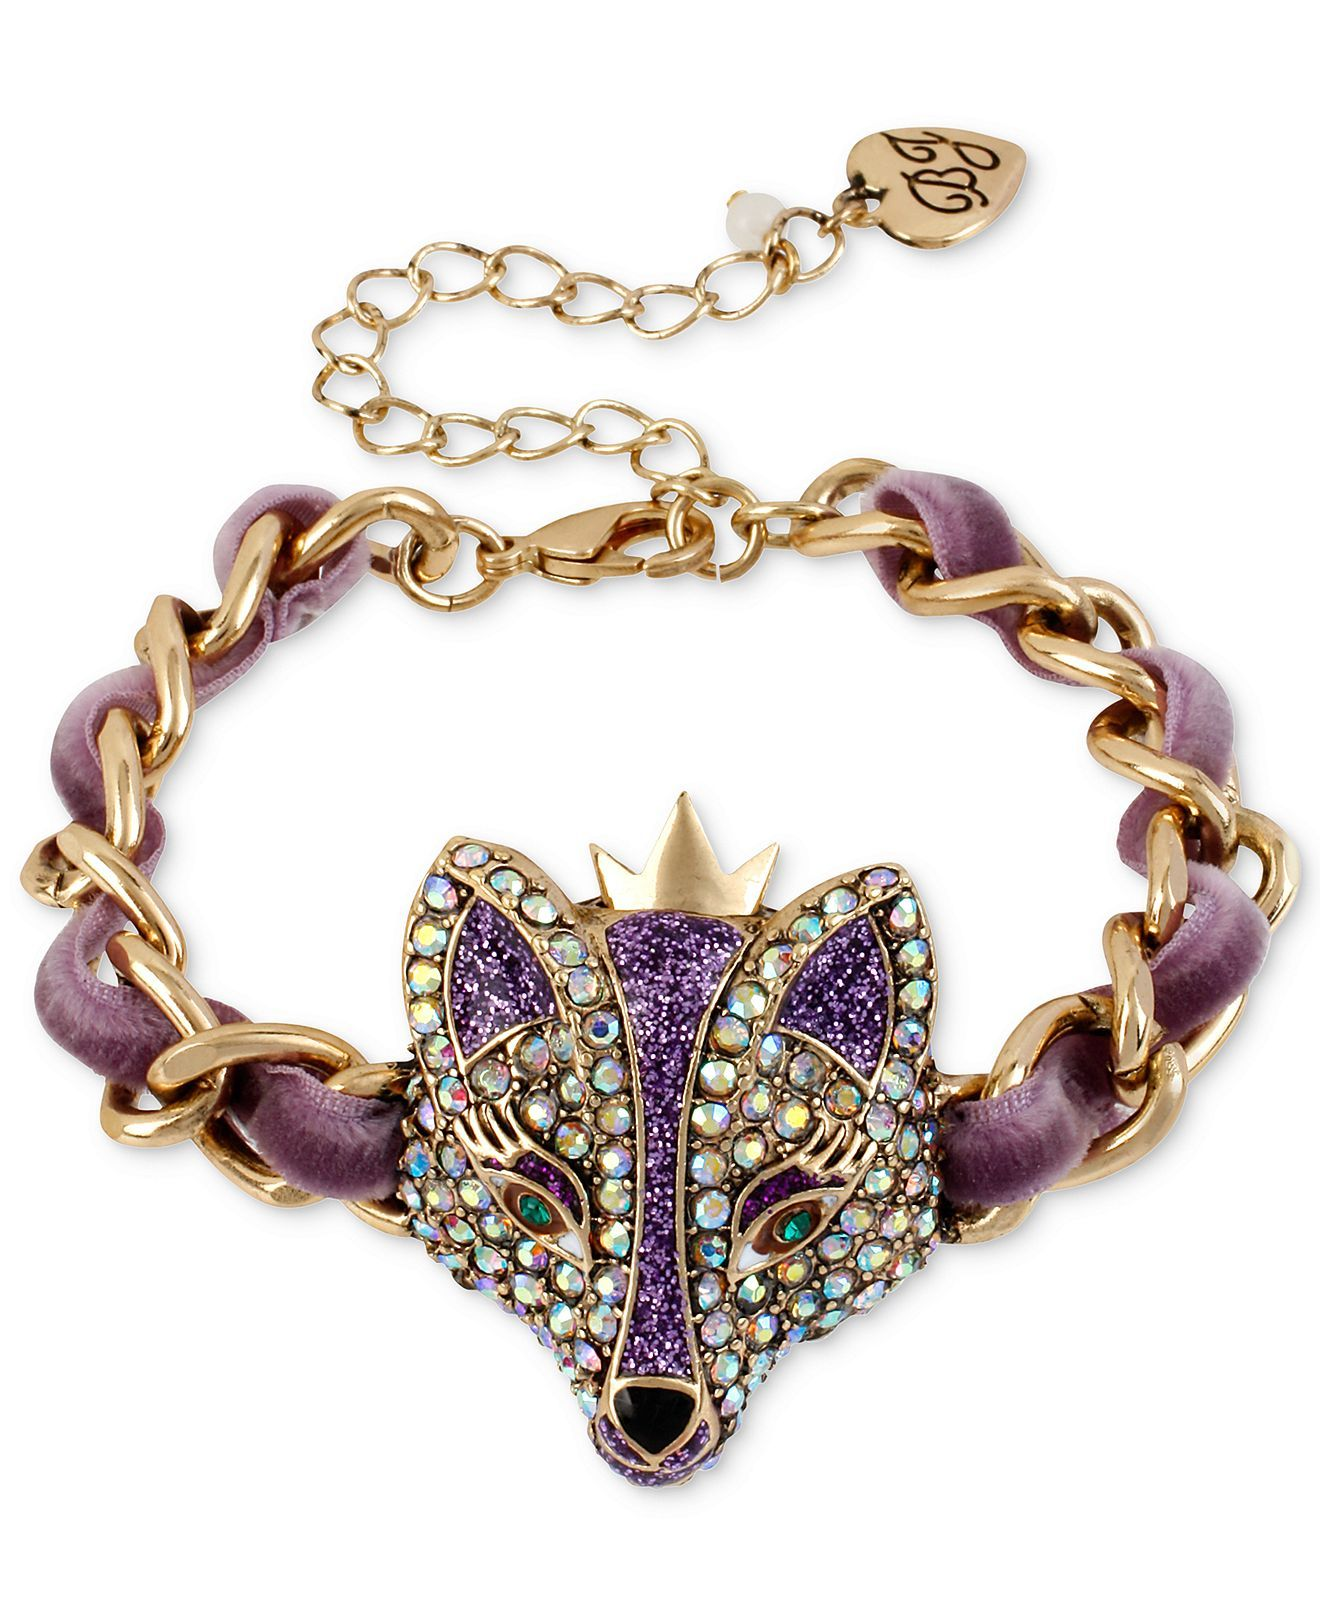 International Fashion Jewellery Accessory-New York 2018 (June) 13